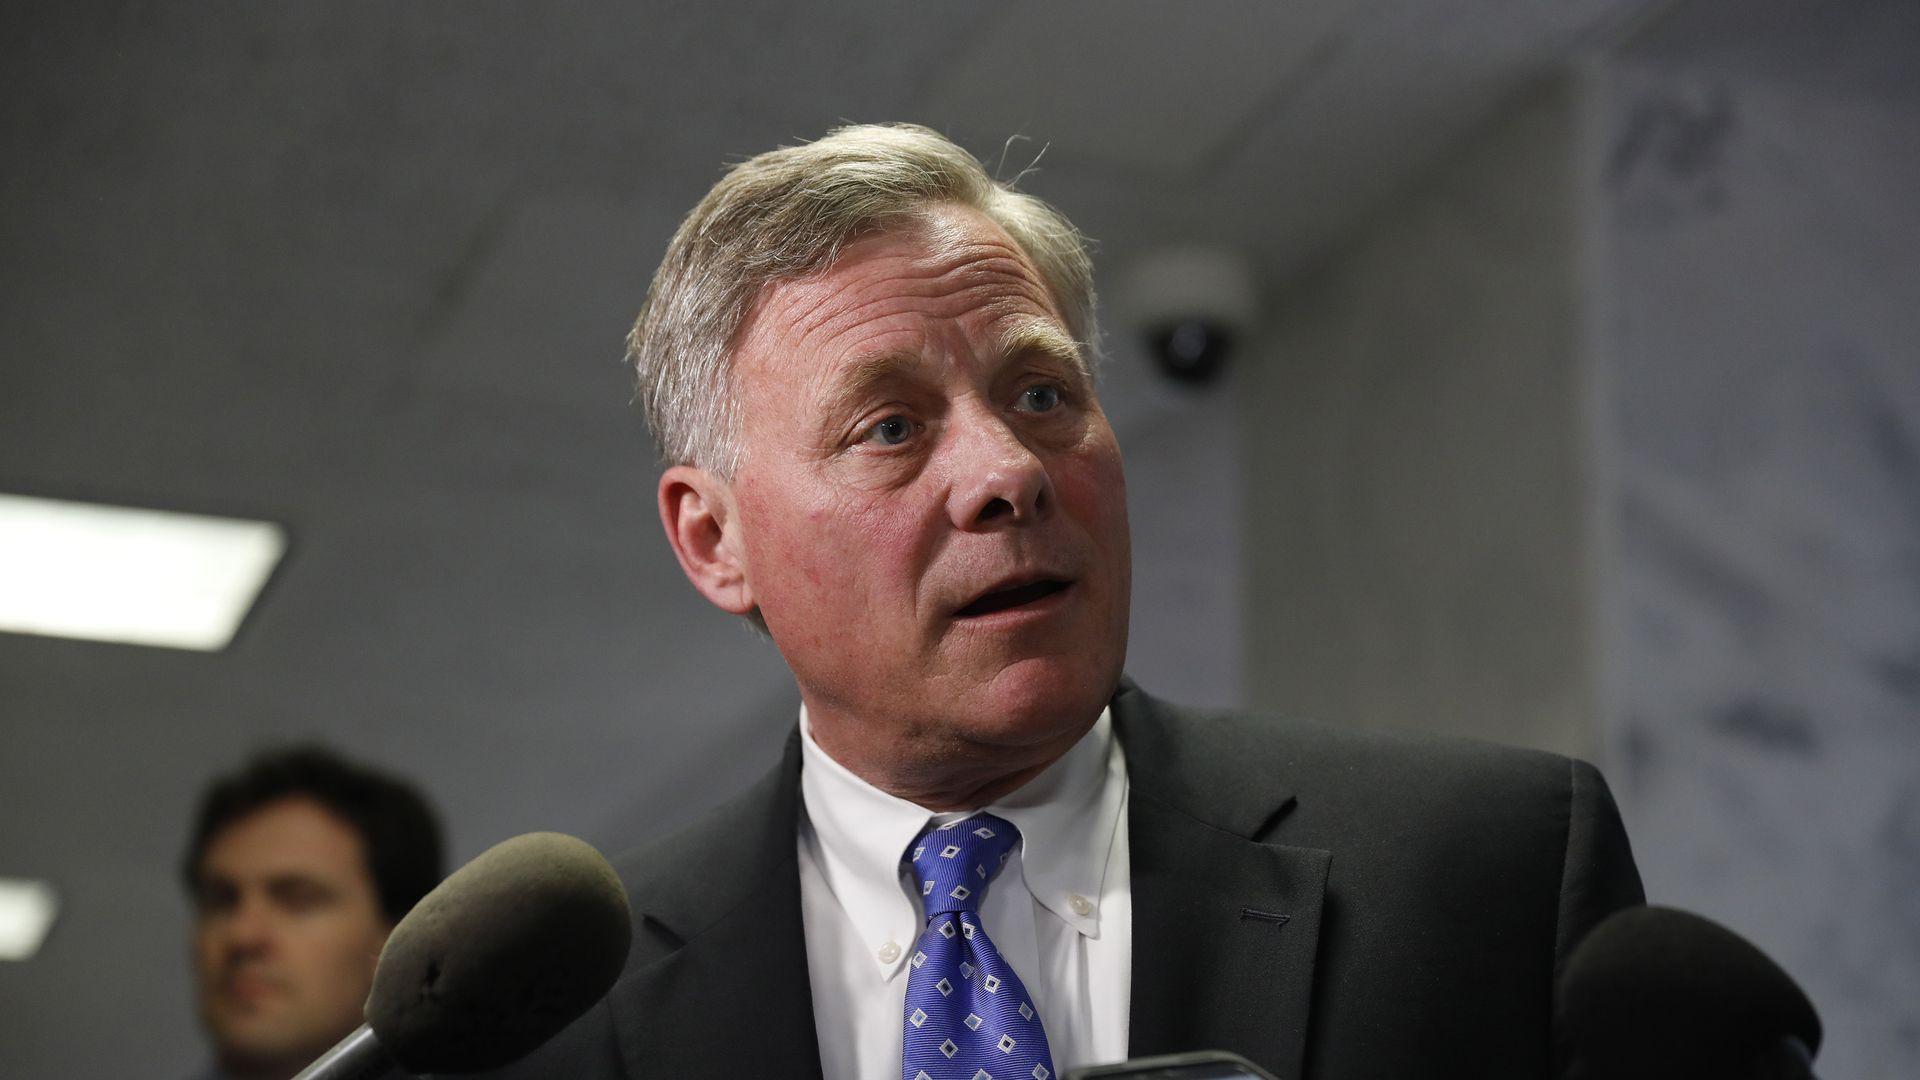 Senate Intelligence Committee Chairman Richard Burr